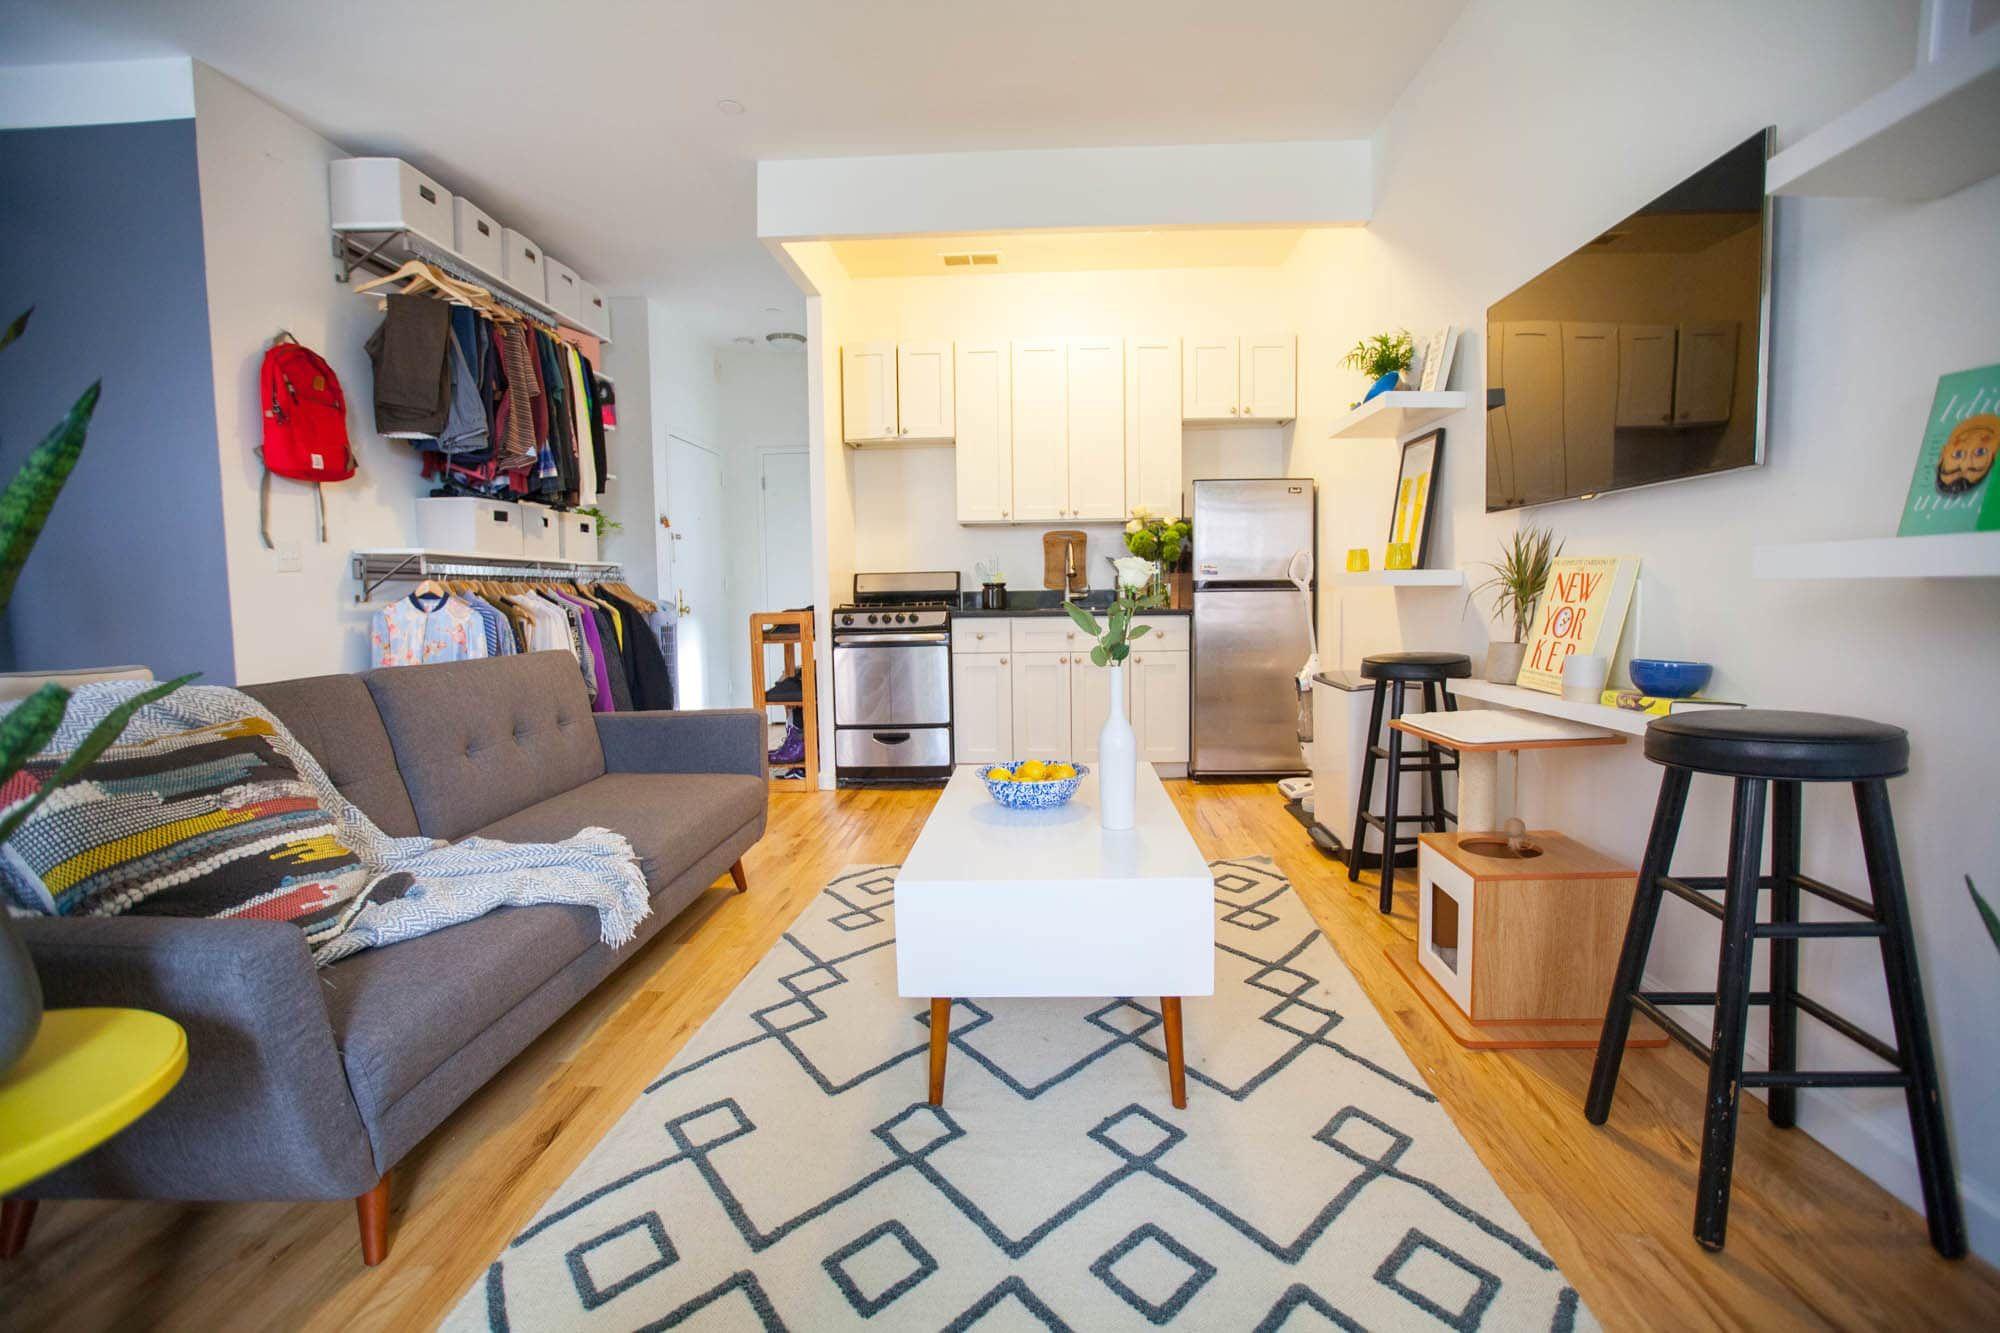 A 450 Square Foot Bronx Studio Apartment Is Cozy But Colorful 1 Bedroom Apartment Studio Apartment One Bedroom Apartment